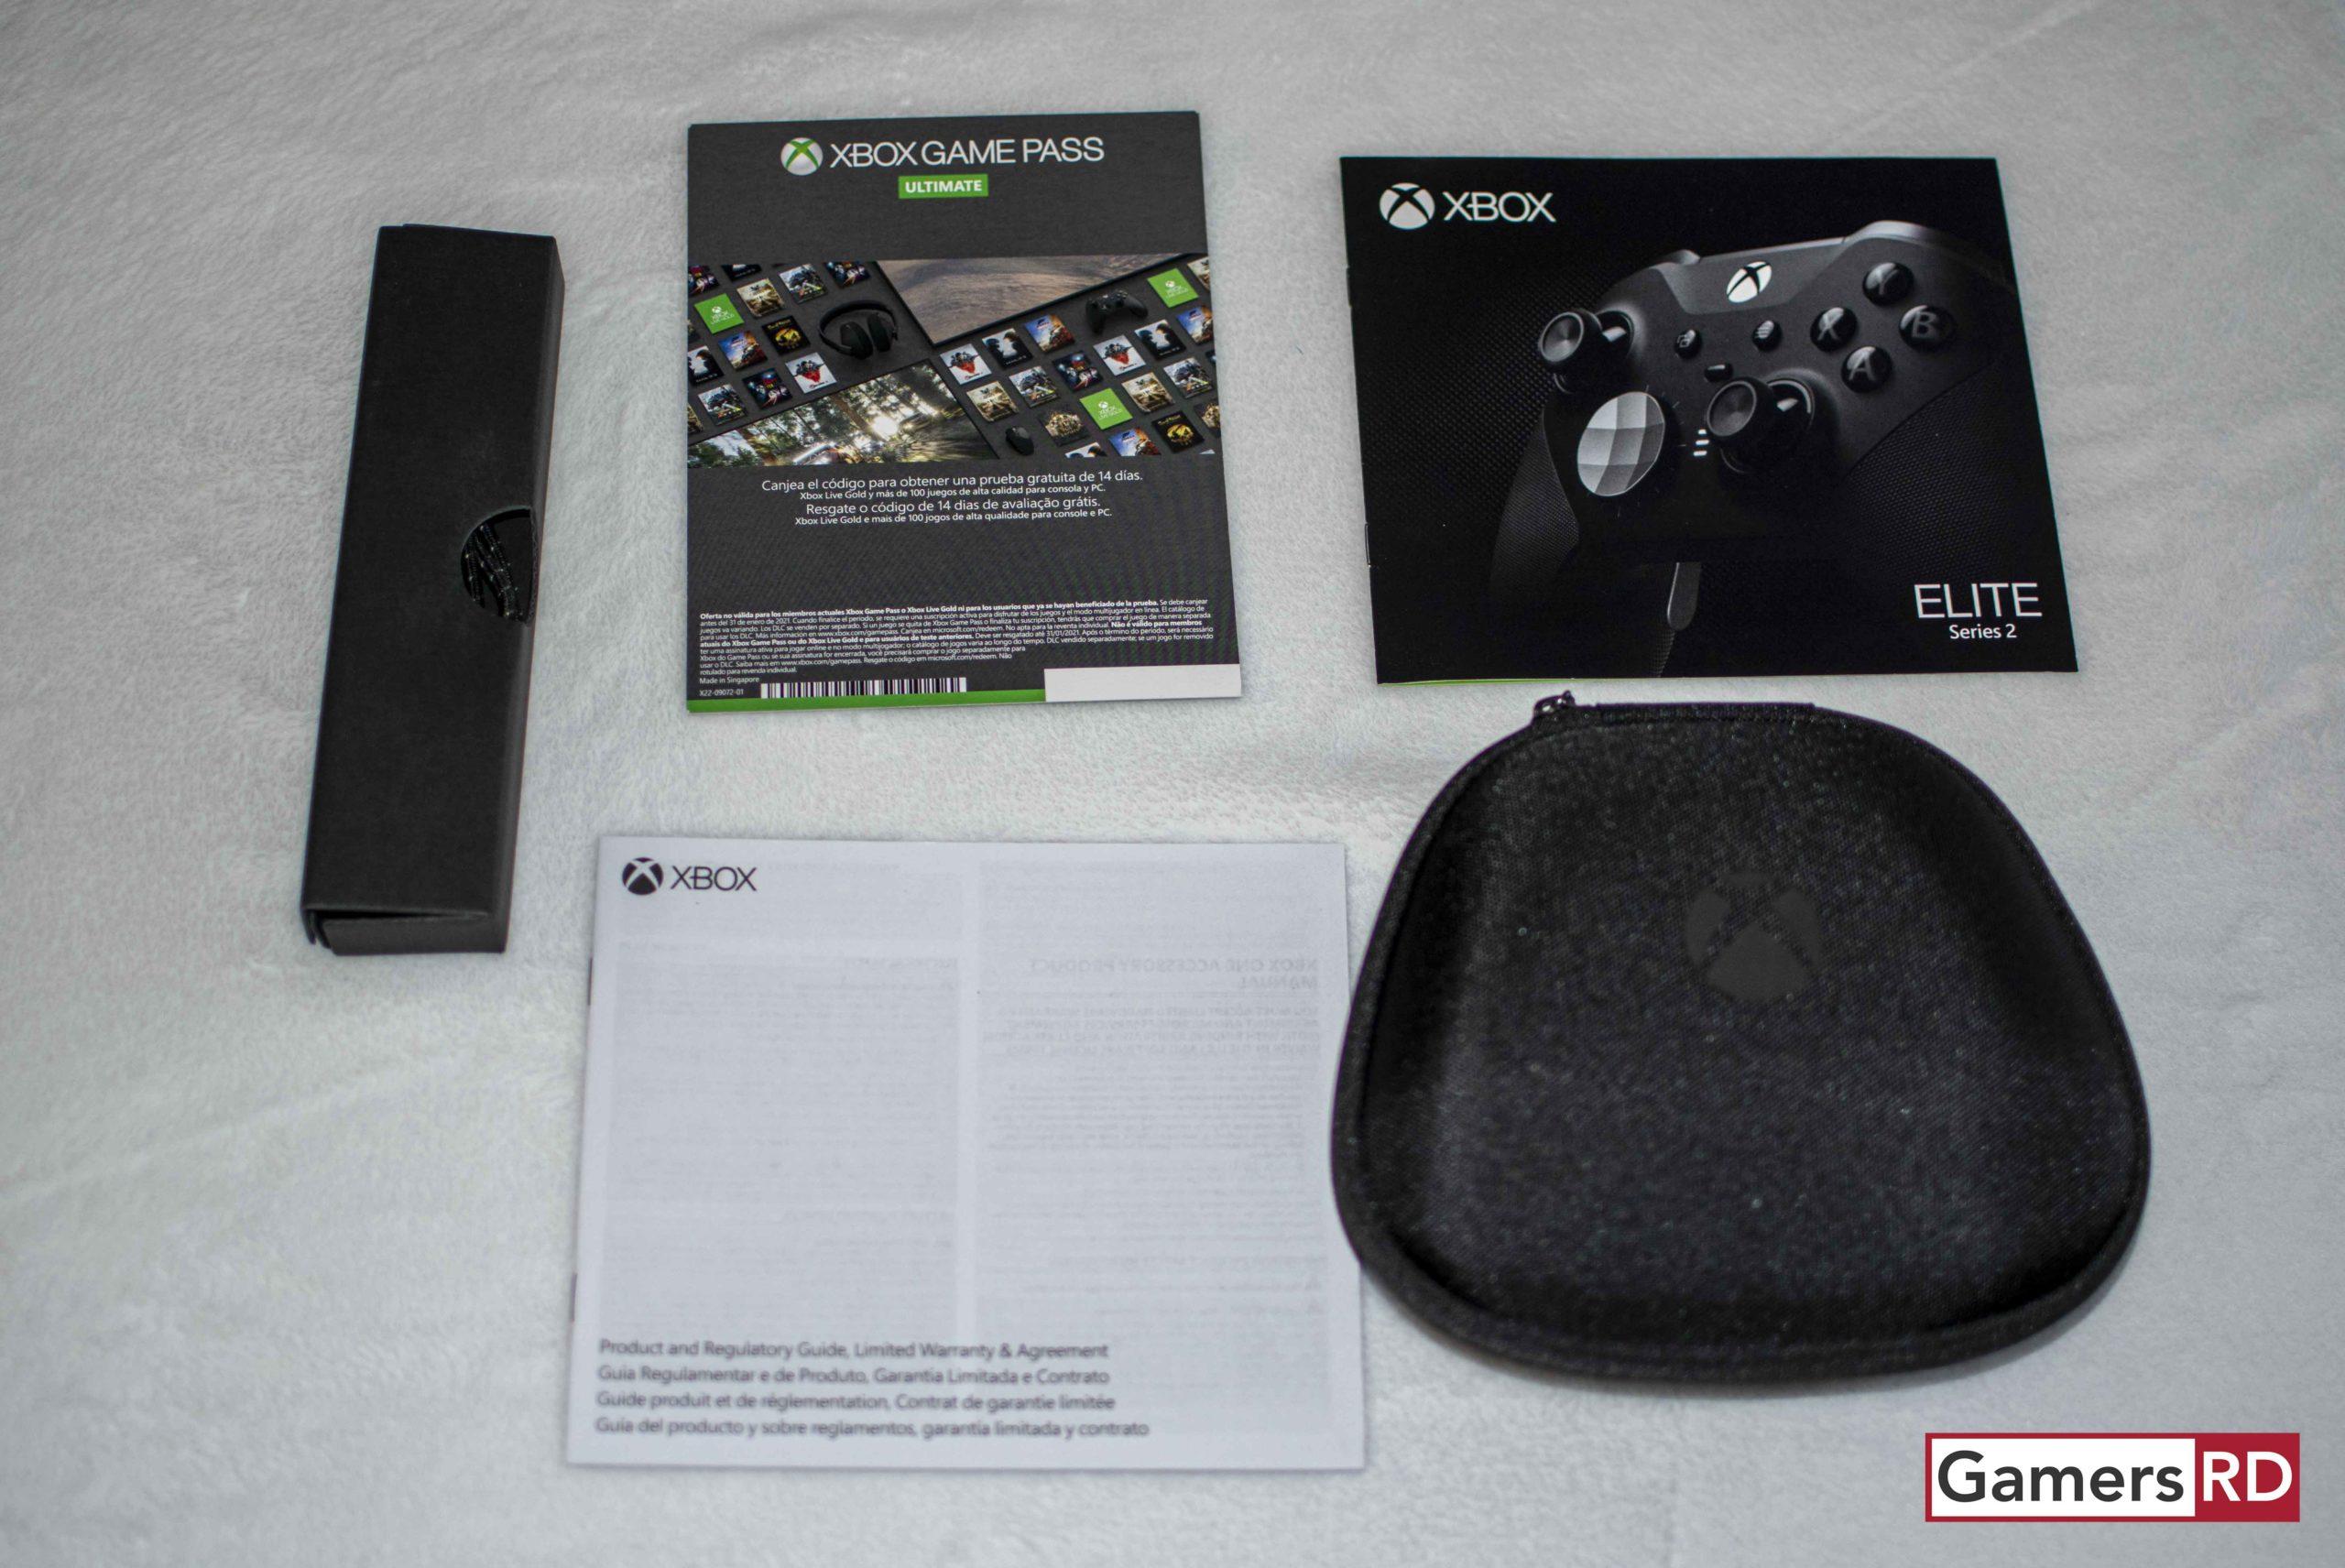 Xbox Elite Wireless Controller Series 2 Review, GamersRD